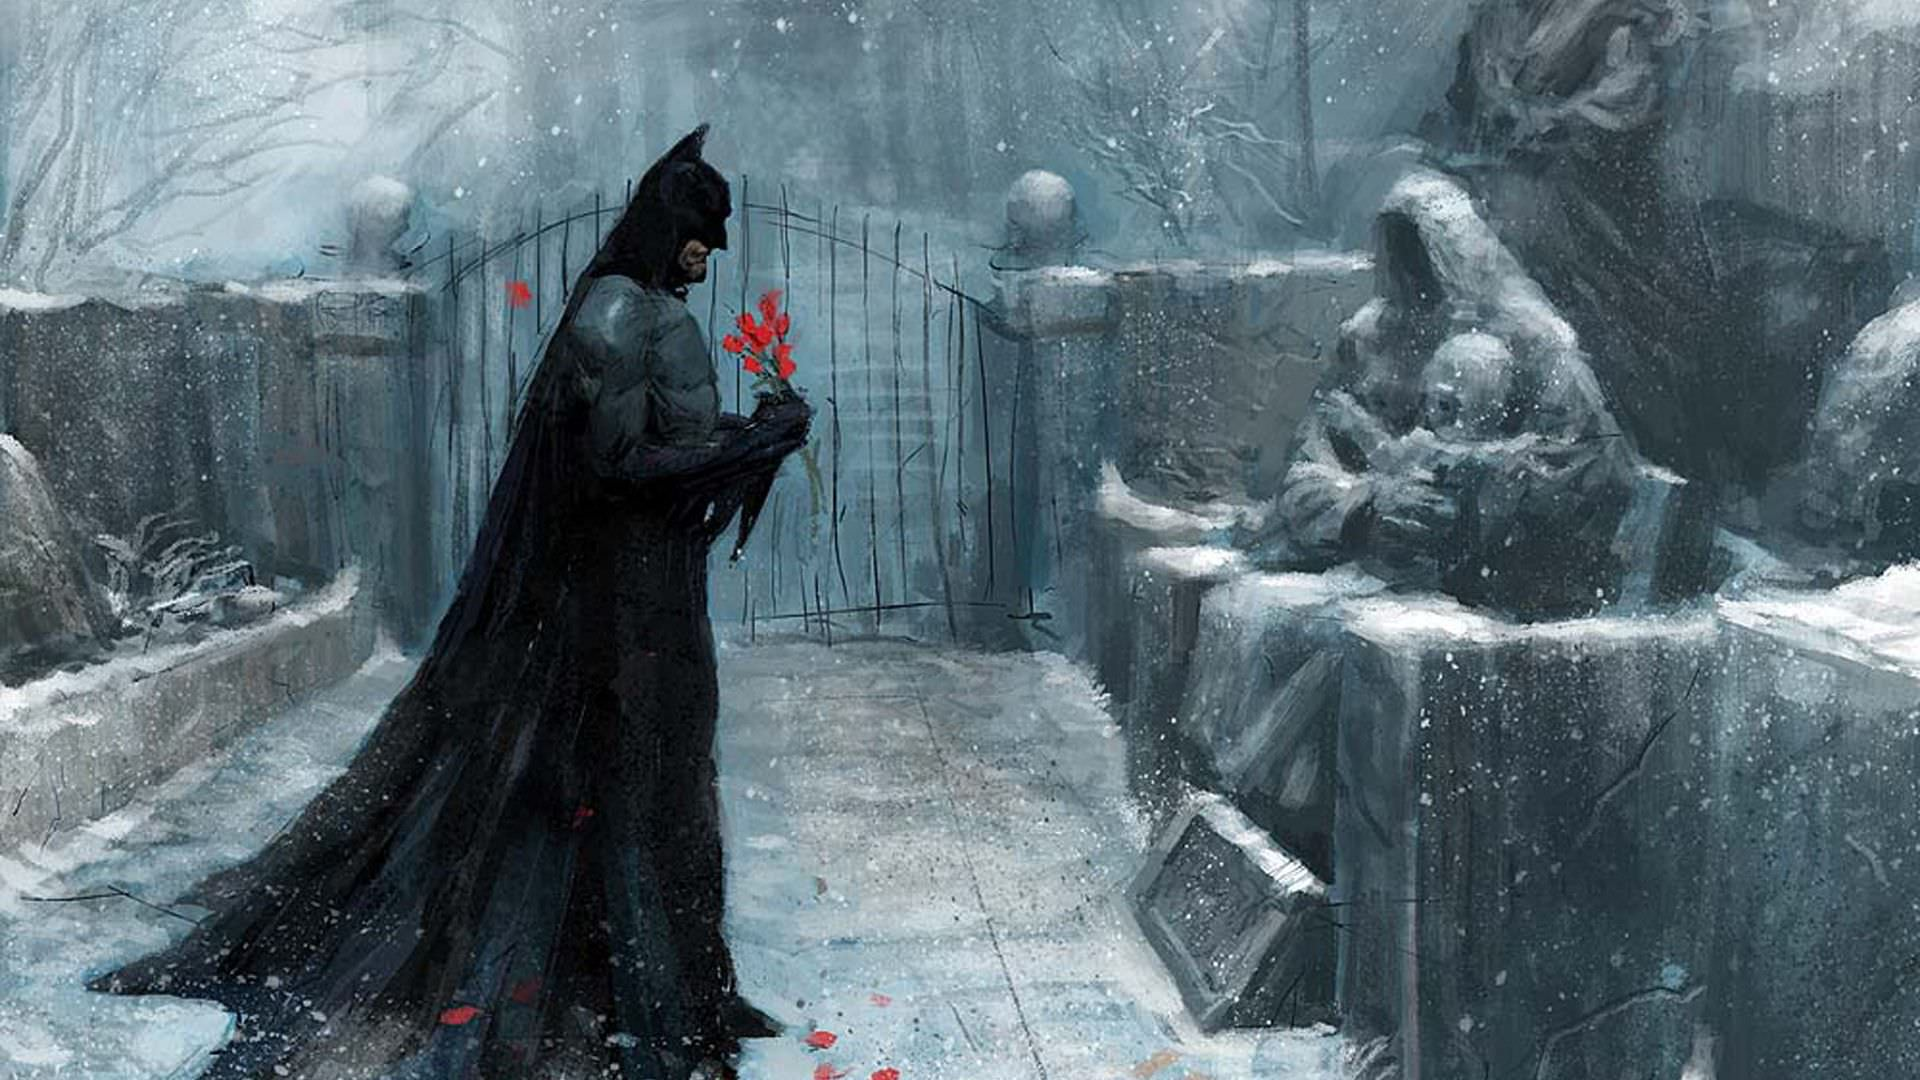 dark batman wallpaper, batman images free